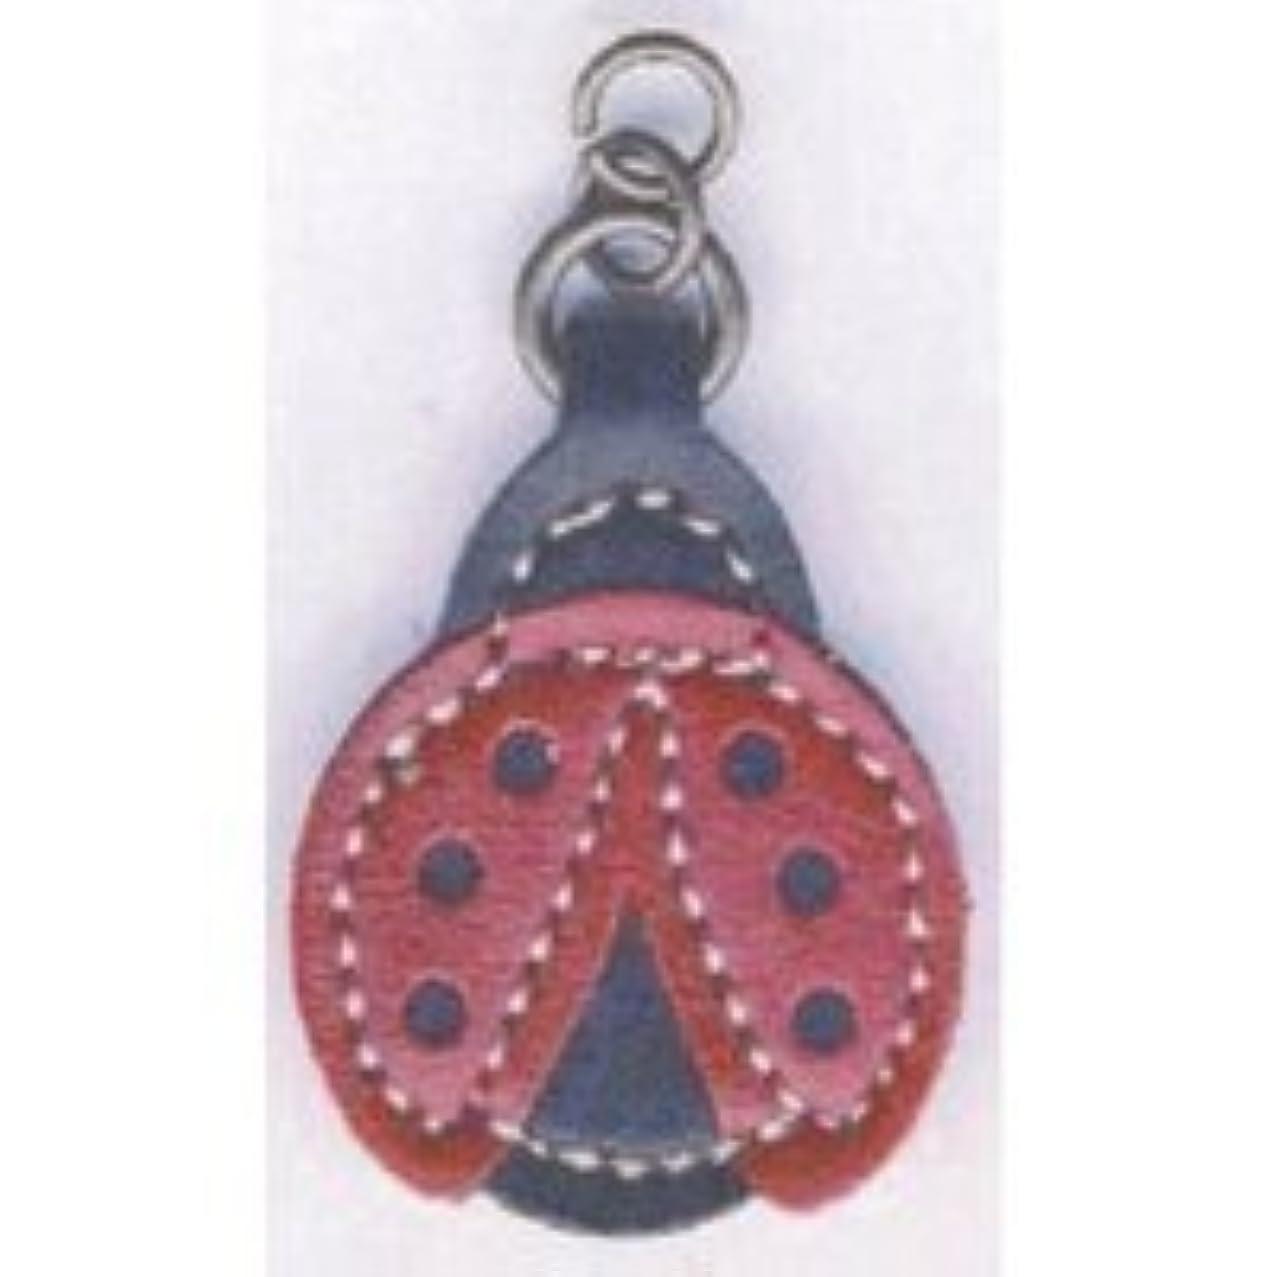 Emma Creations Zipper Charm Leather Like Ladybug Black and Red,